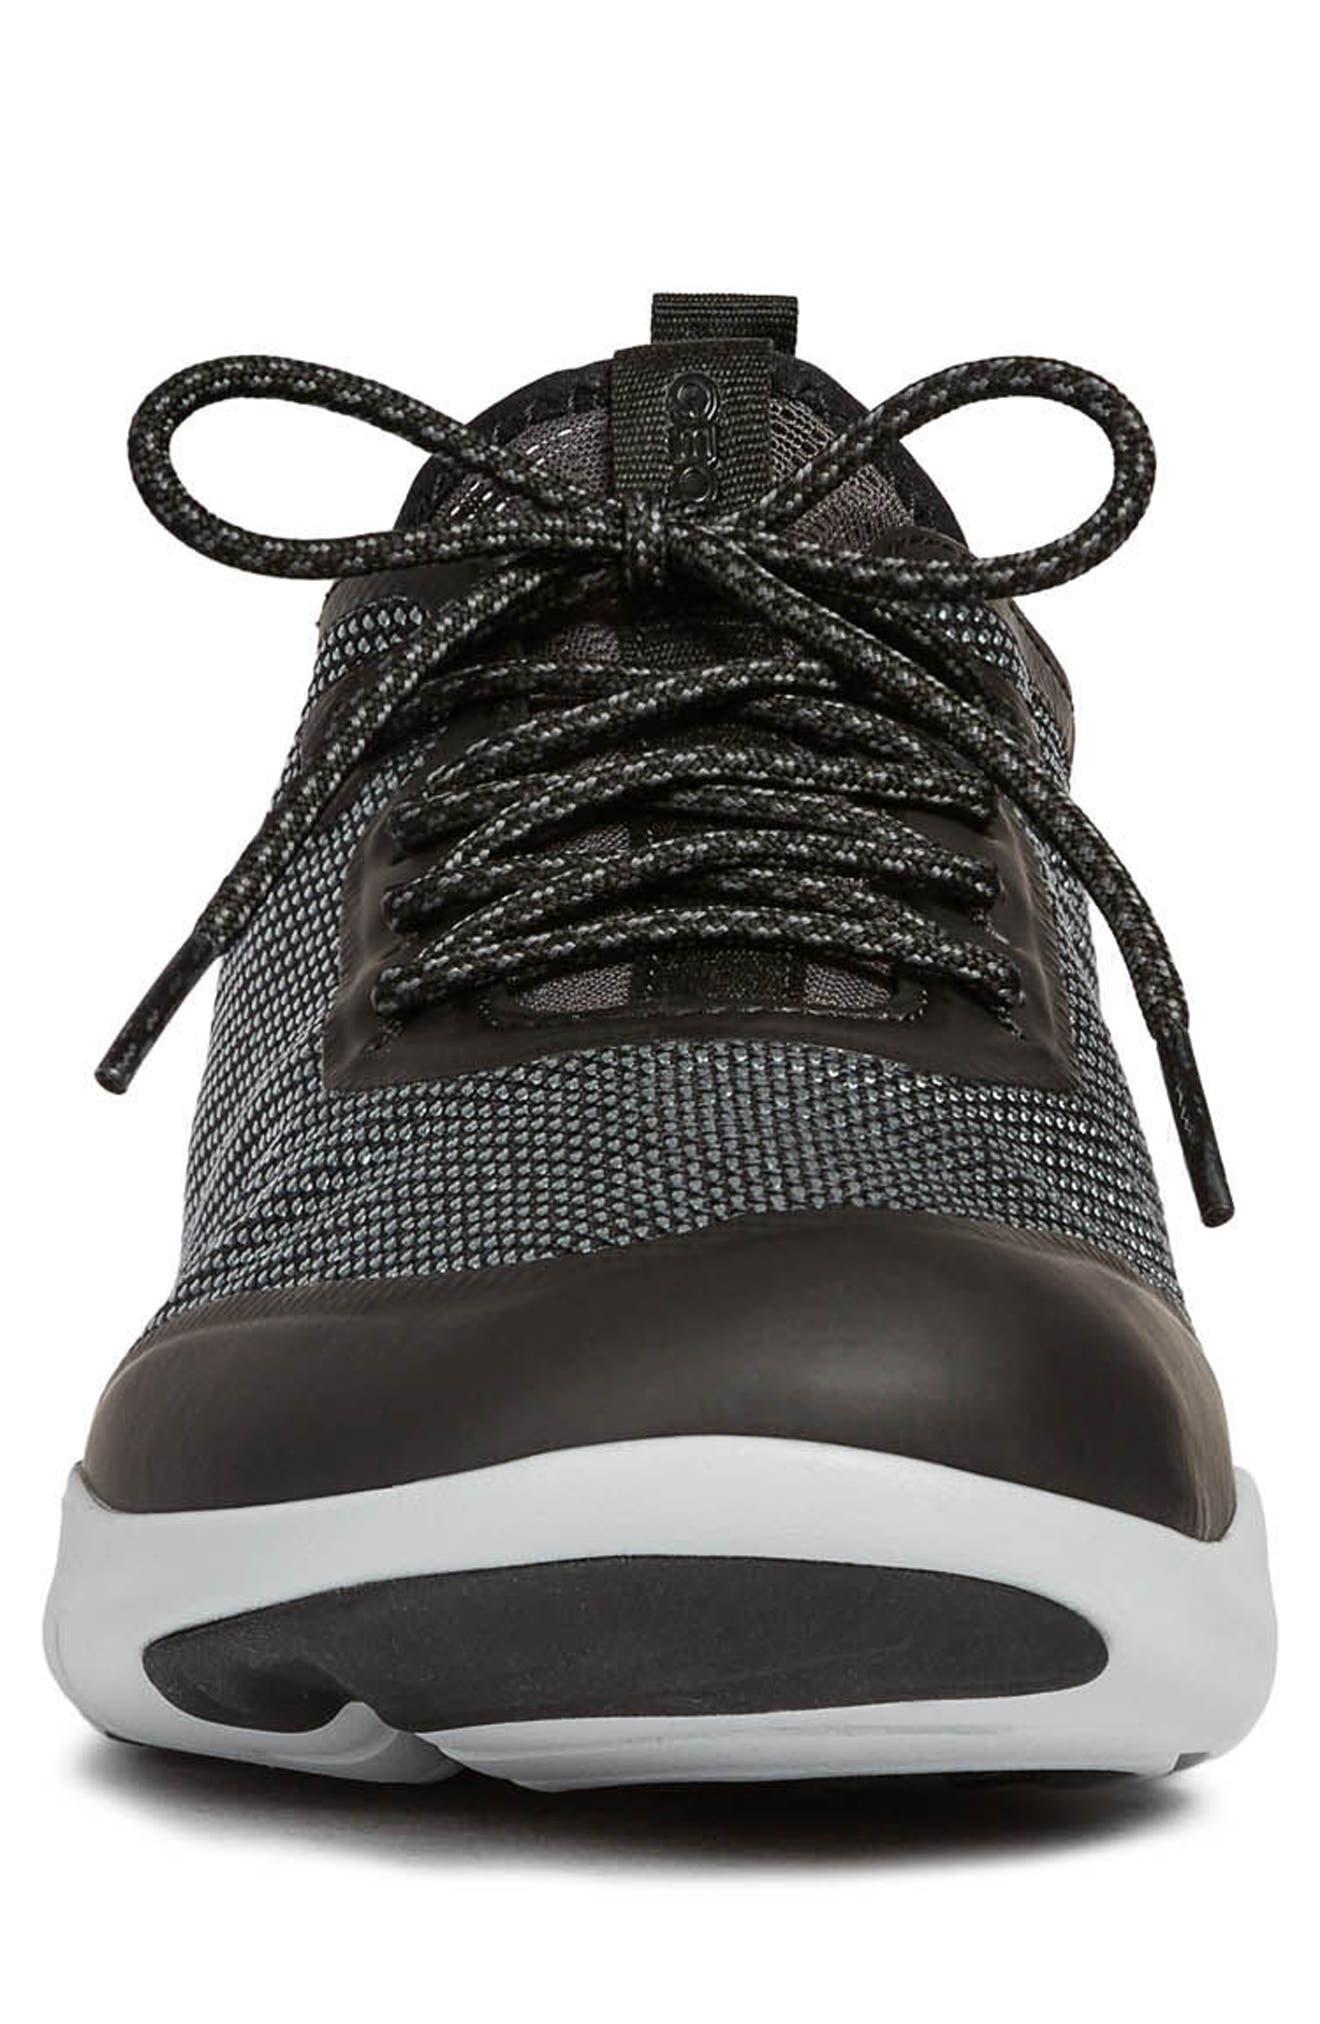 Nebula X 3 Low Top Sneaker,                             Alternate thumbnail 4, color,                             BLACK LEATHER